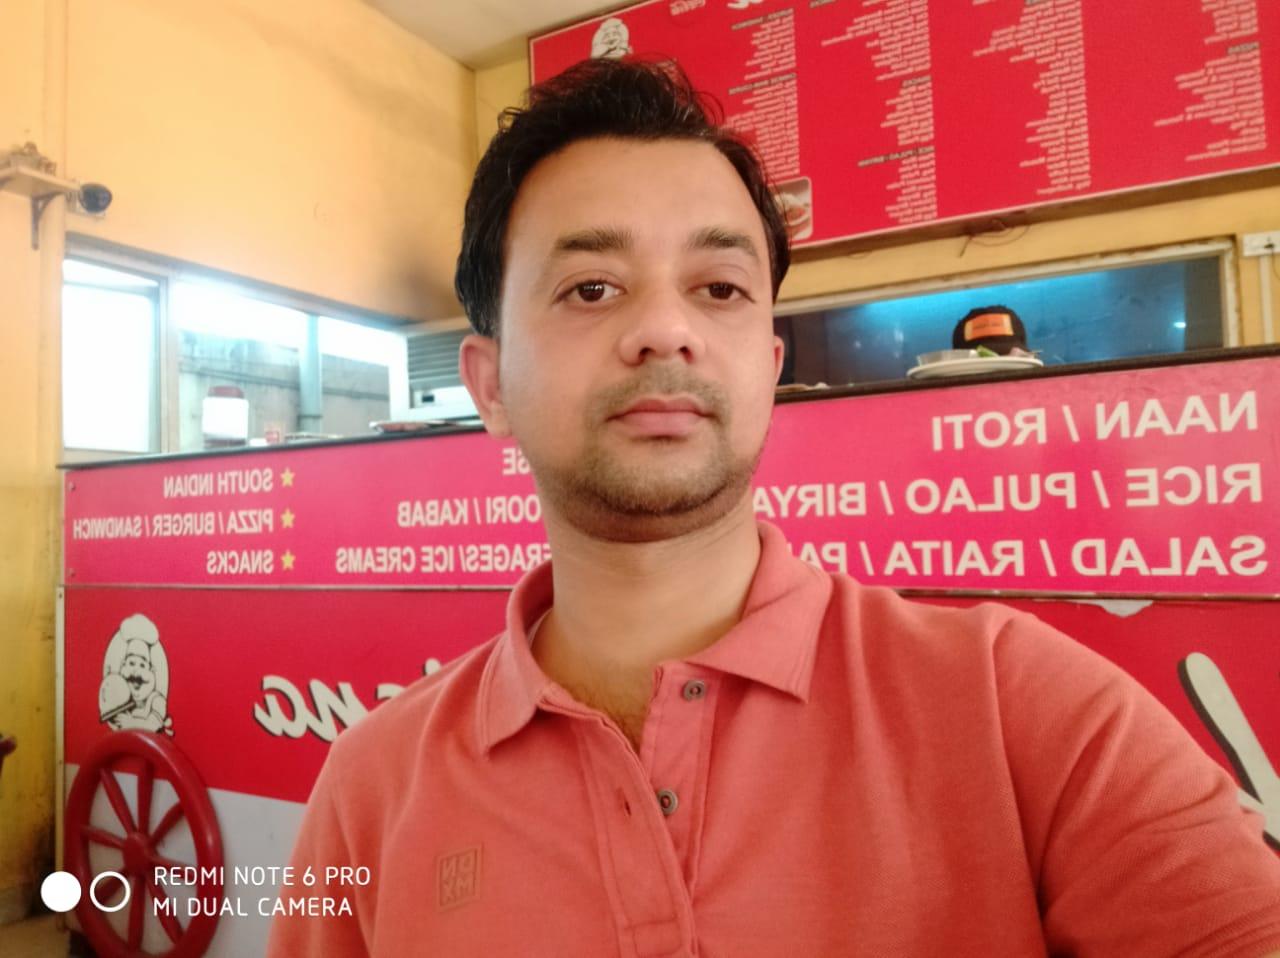 Sri ANIRBAN SAHA